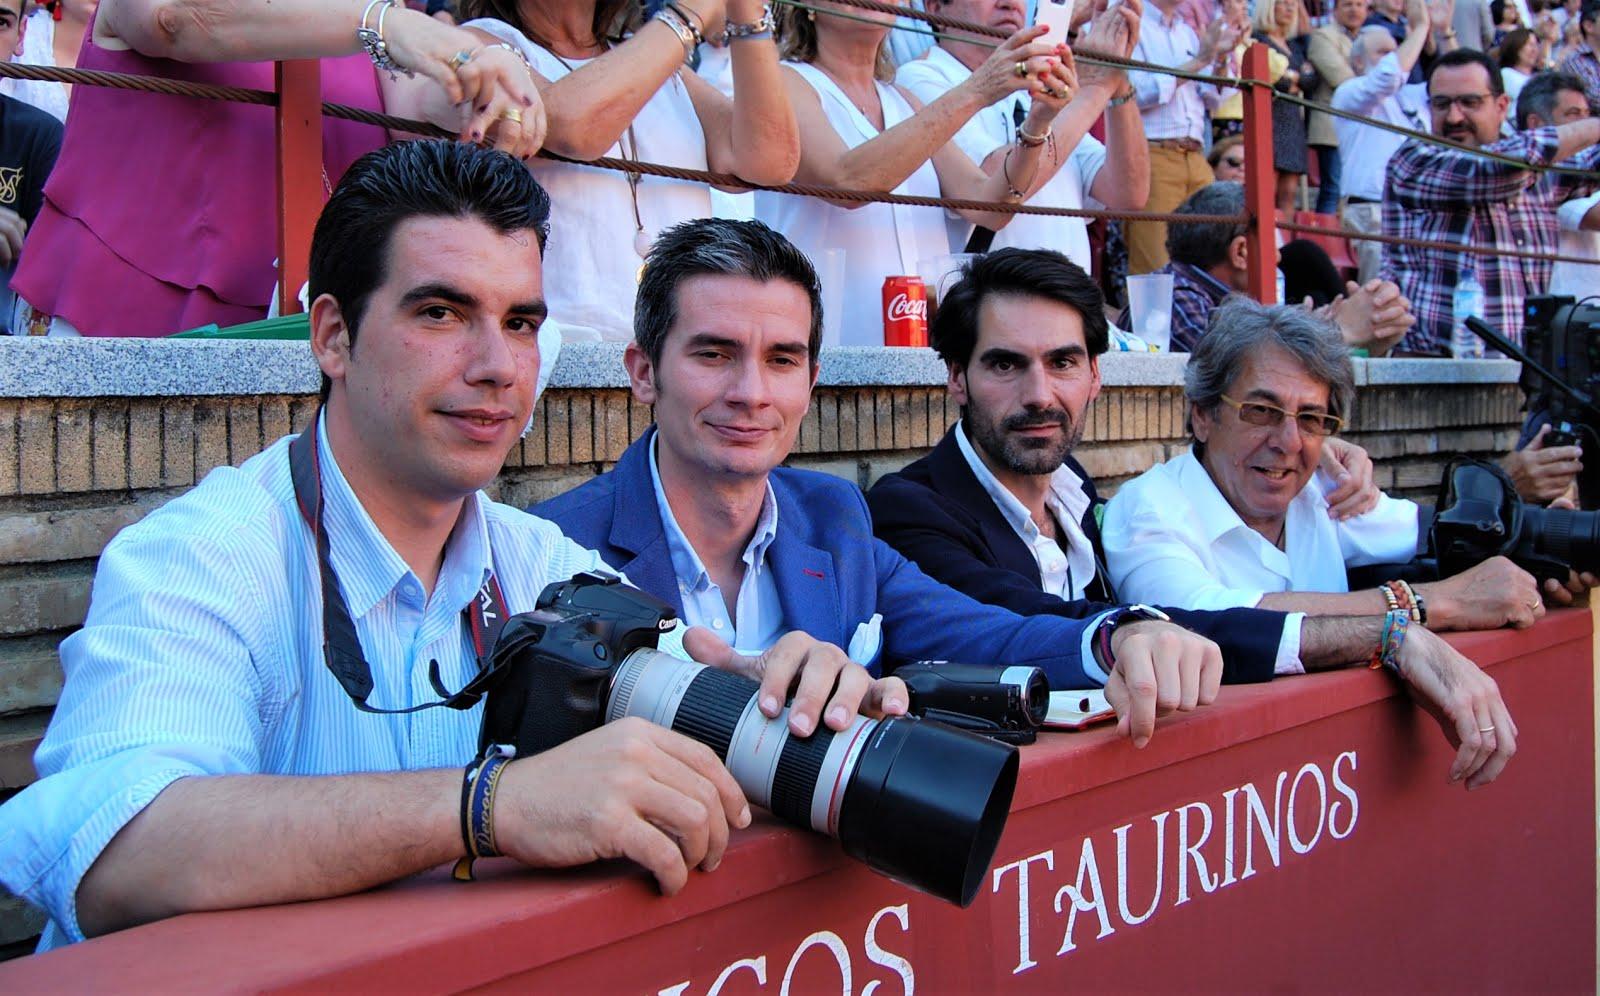 RAUL, FIDEL, RUFINO,CUEVAS